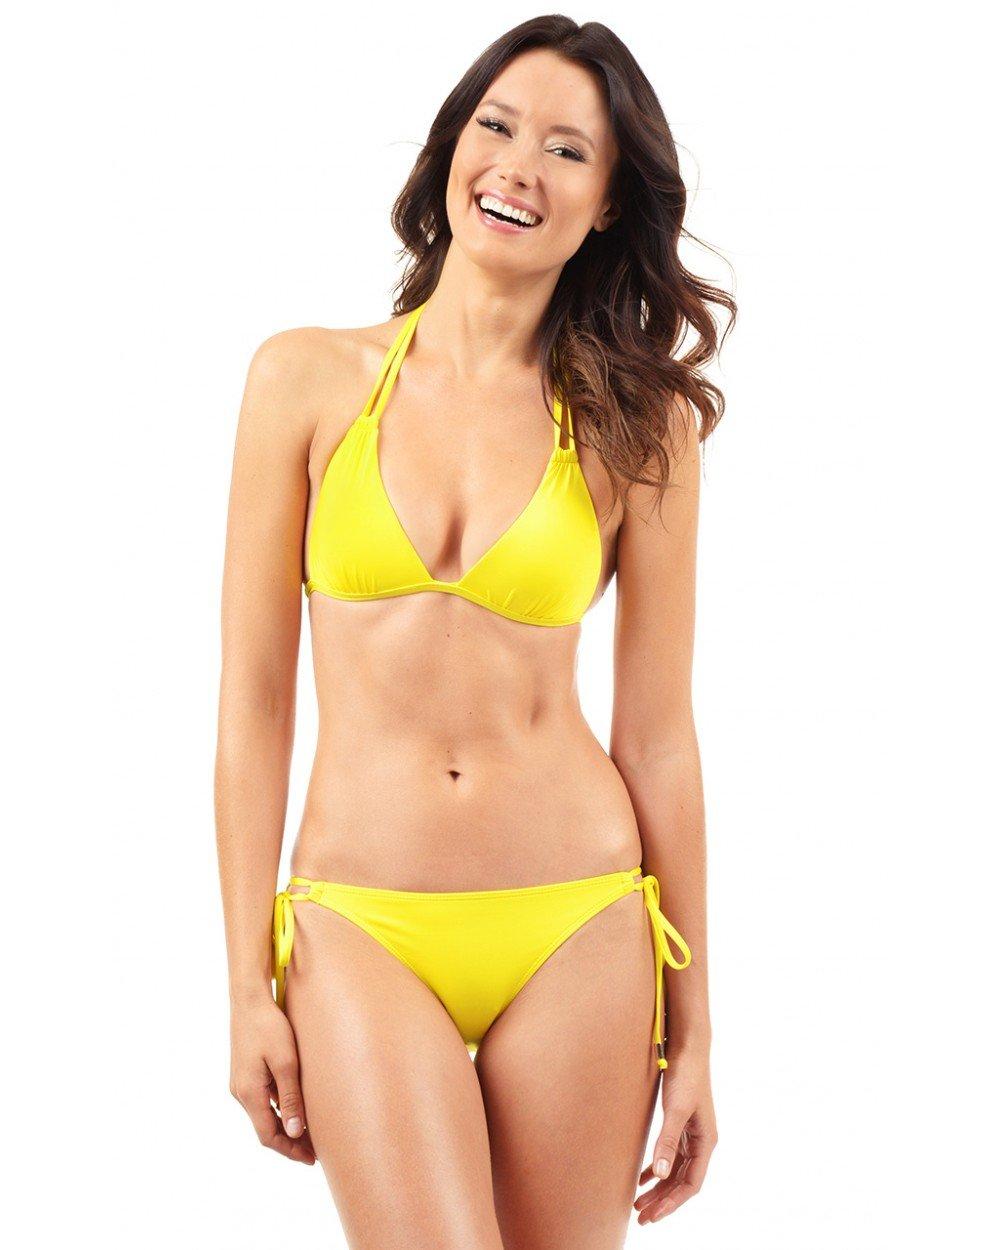 Voda Swim Women's Envy Push up Double String Bikini Top M Yellow